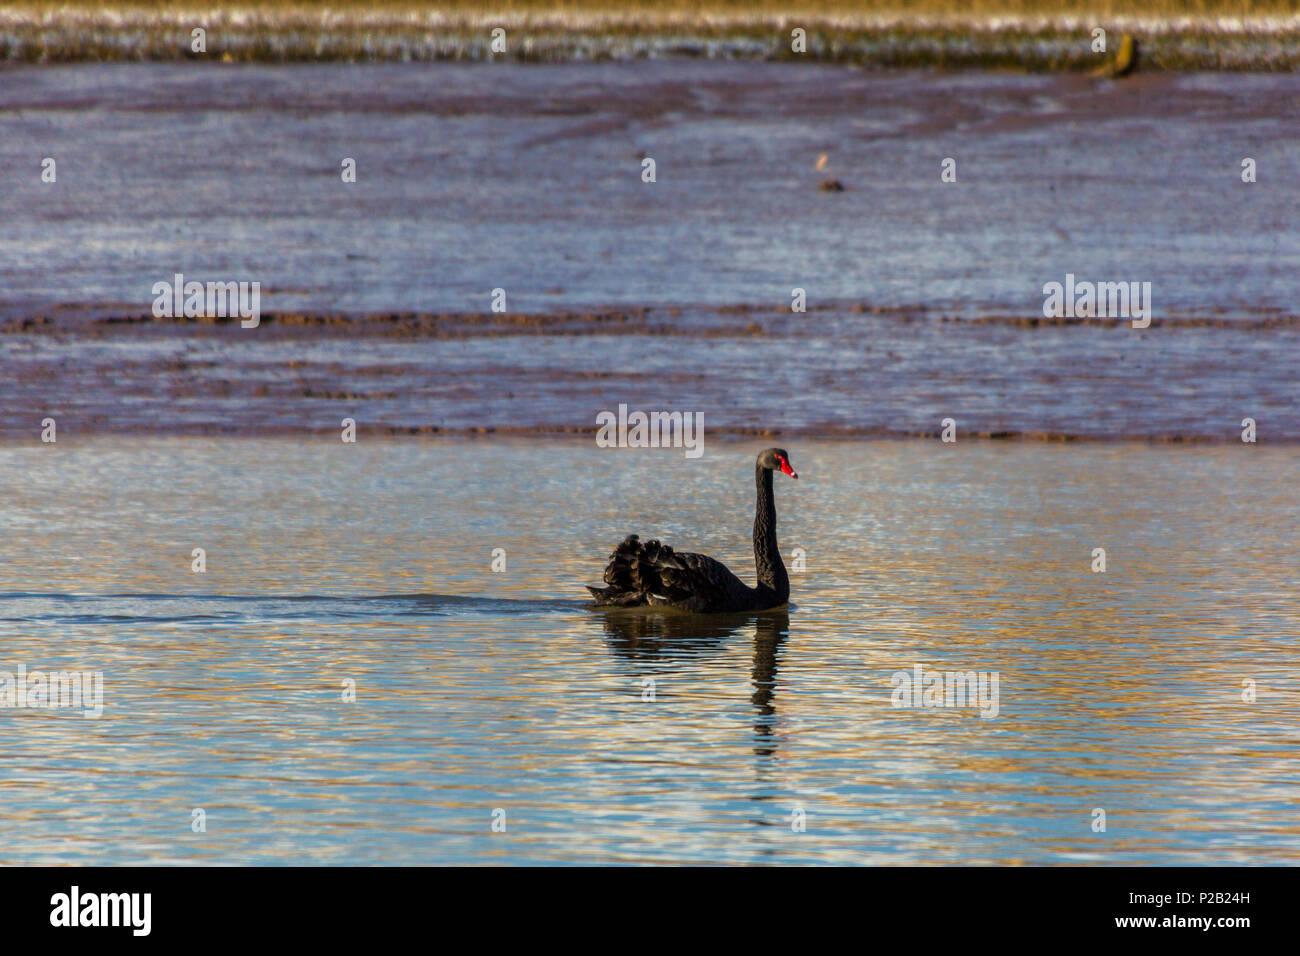 A black swan (Cygnus atratus)  drifting along the River Exe in winter near Topsham, Devon, England, UK - Stock Image